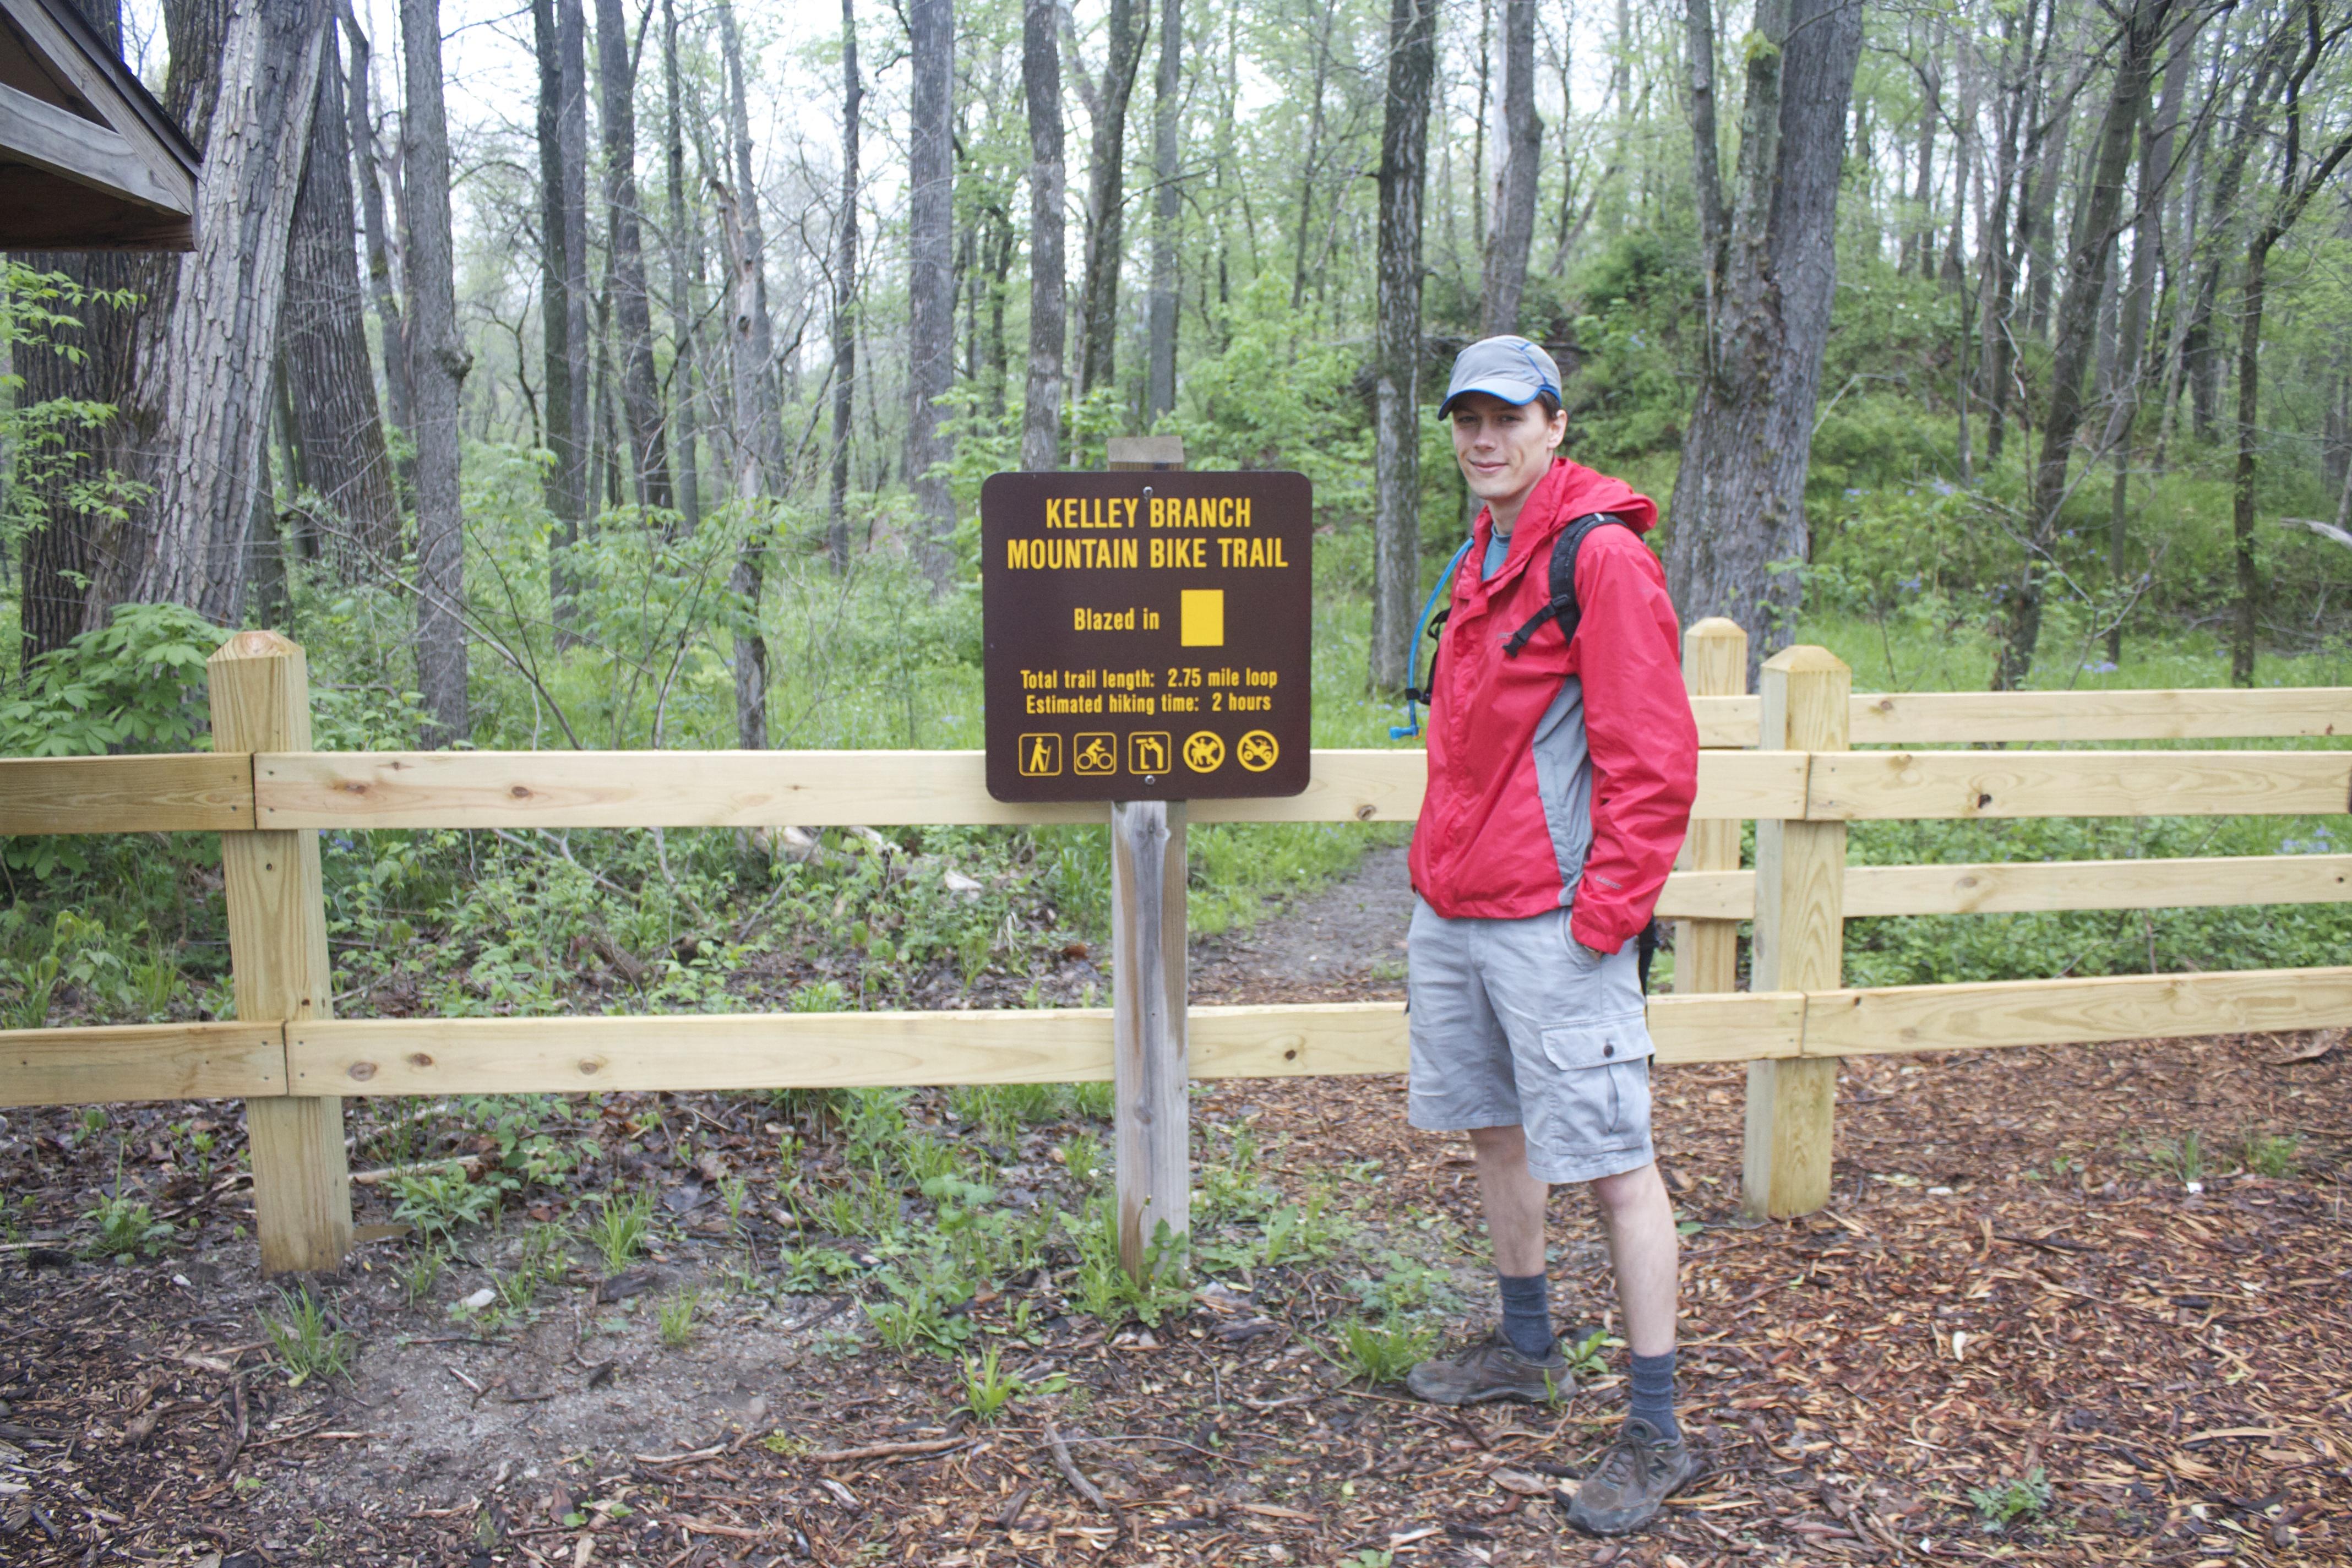 SHOW-ME ADVENTURE: Finger Lakes State Park